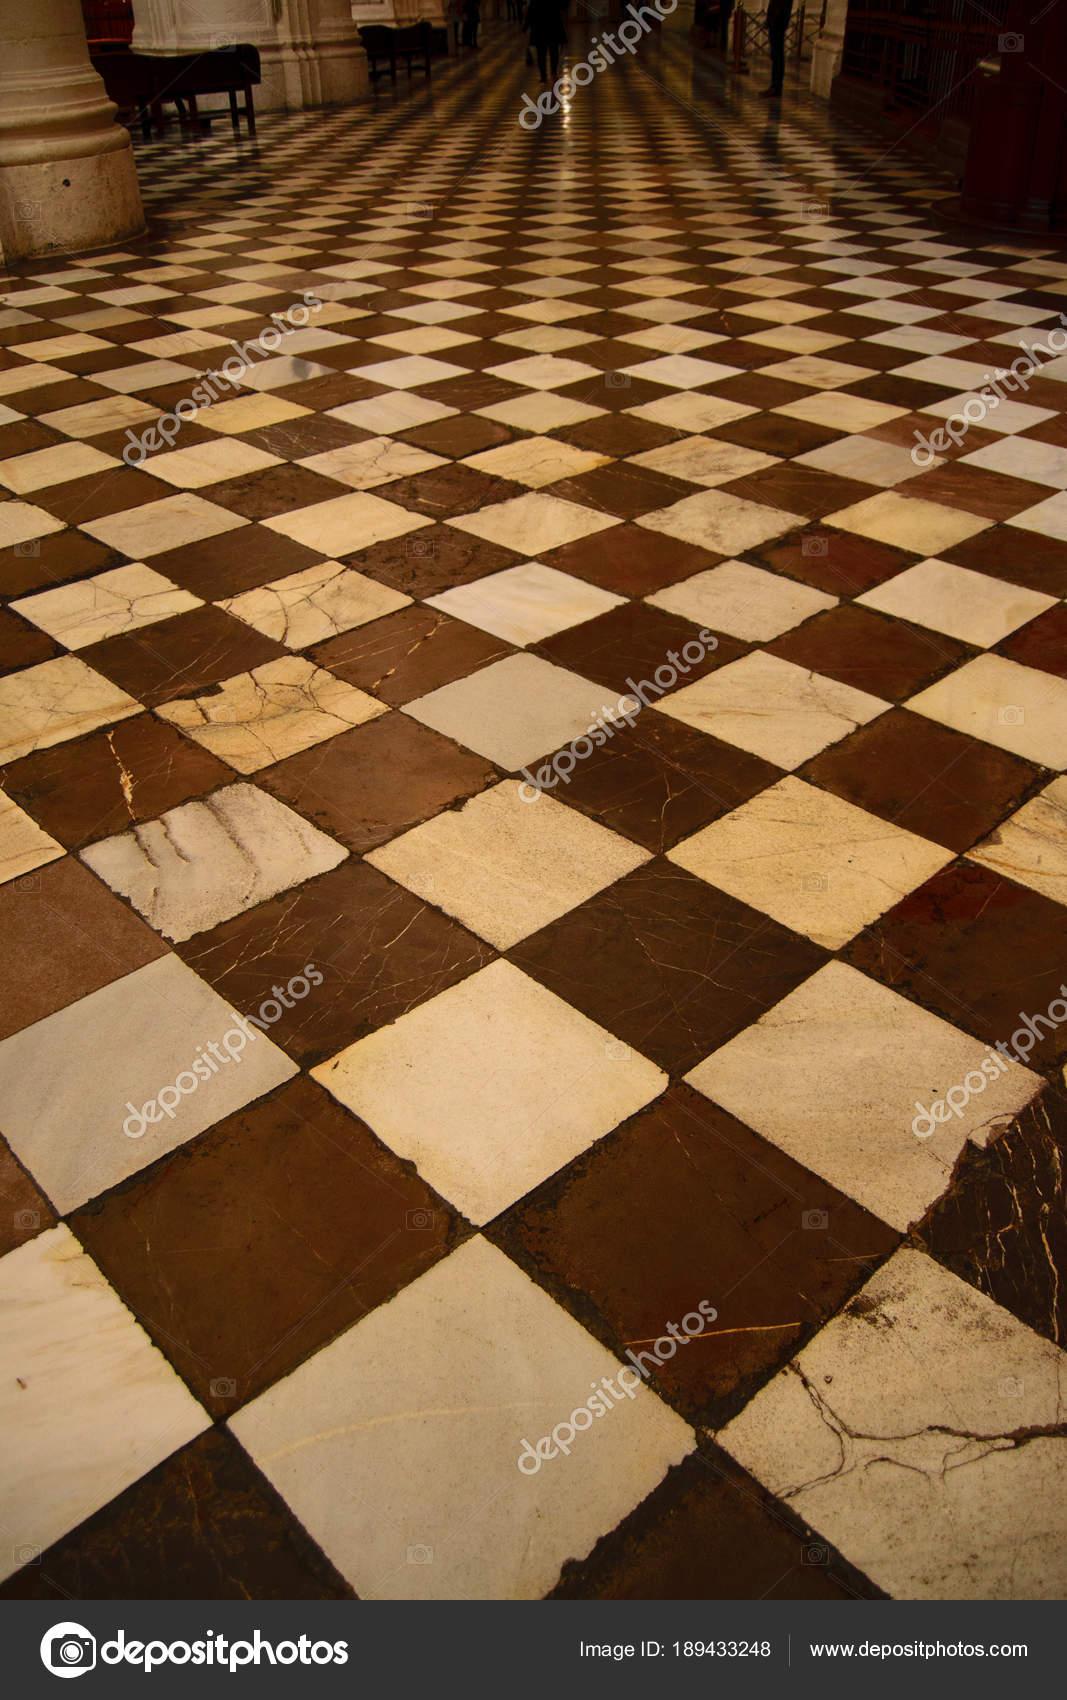 Floor Chessboard Design Stock Photo Image By C Diegodiazpiedra 189433248